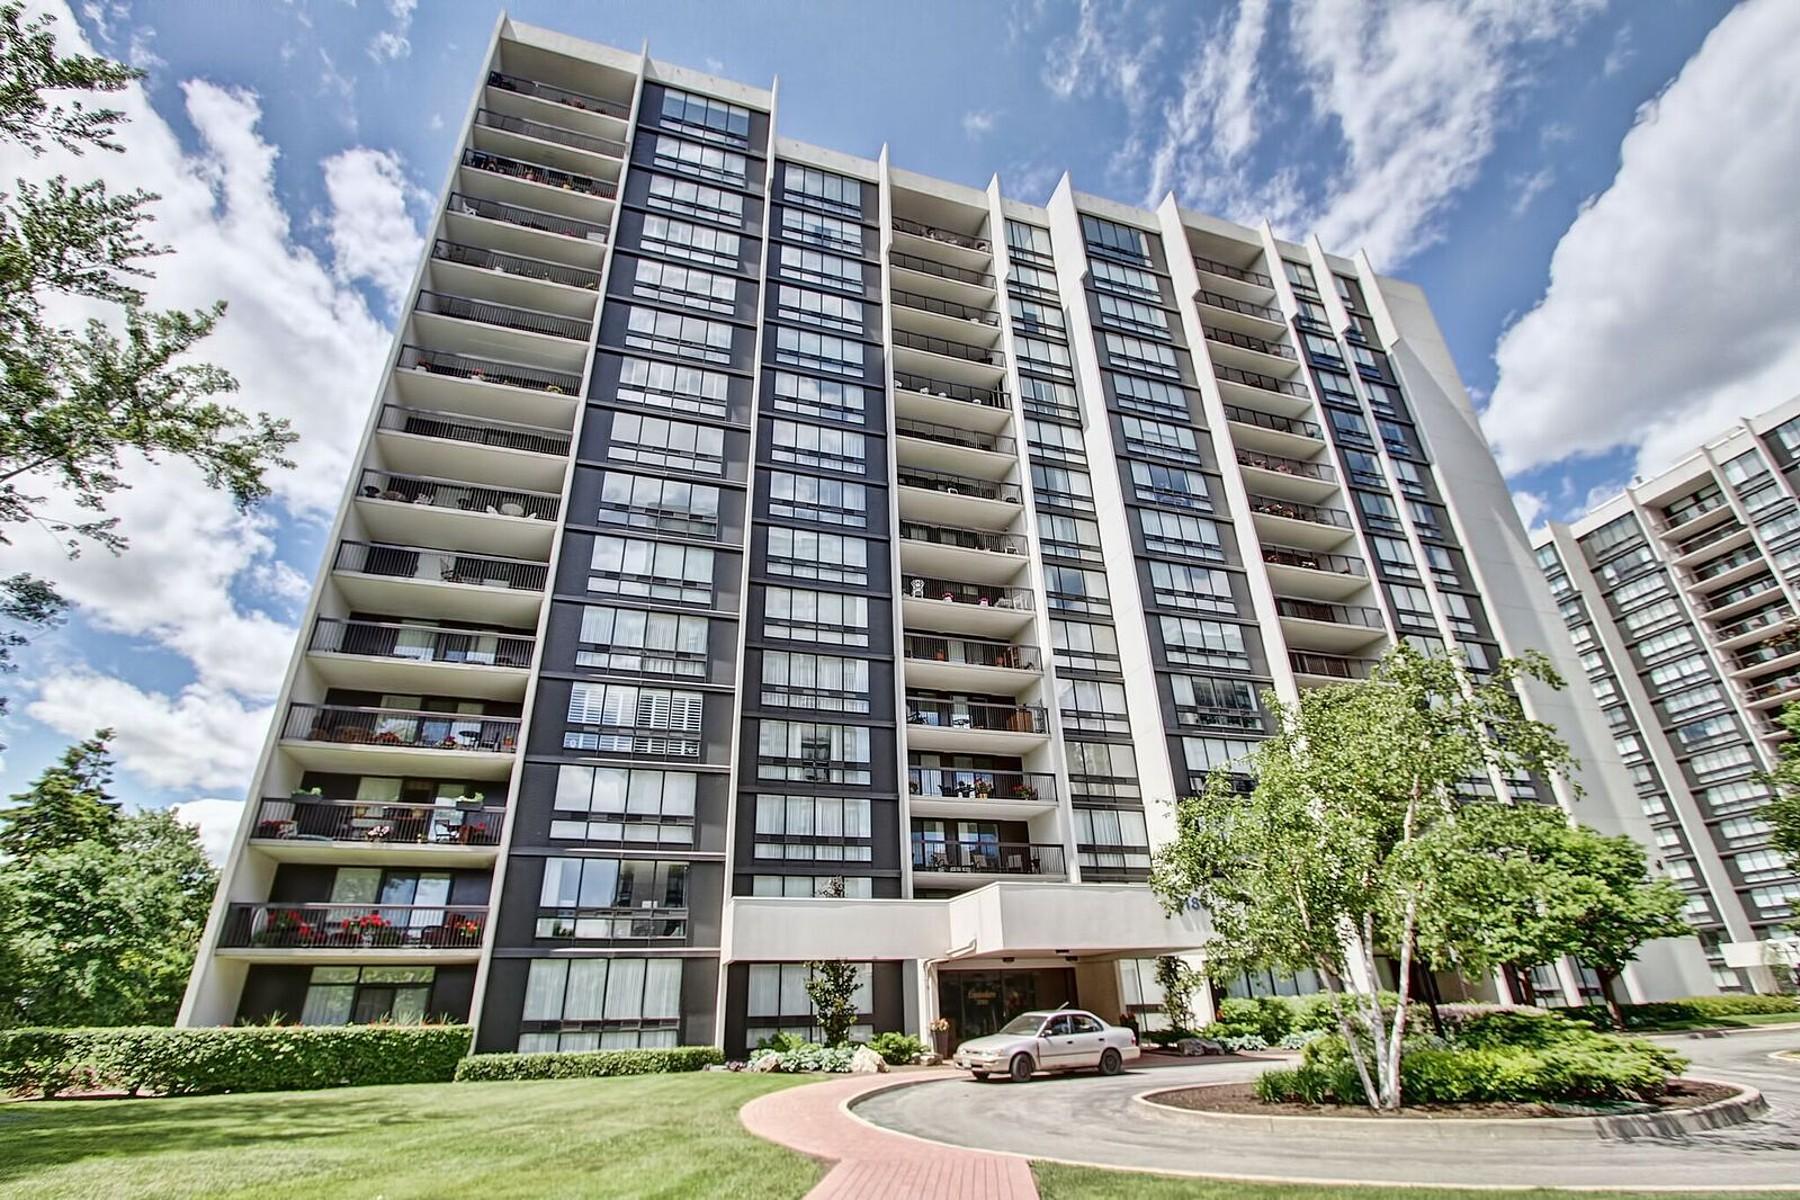 Кооперативная квартира для того Продажа на Ennisclare On The Lake 2185 Marine Dr Oakville, Онтарио, L5L6L6 Канада